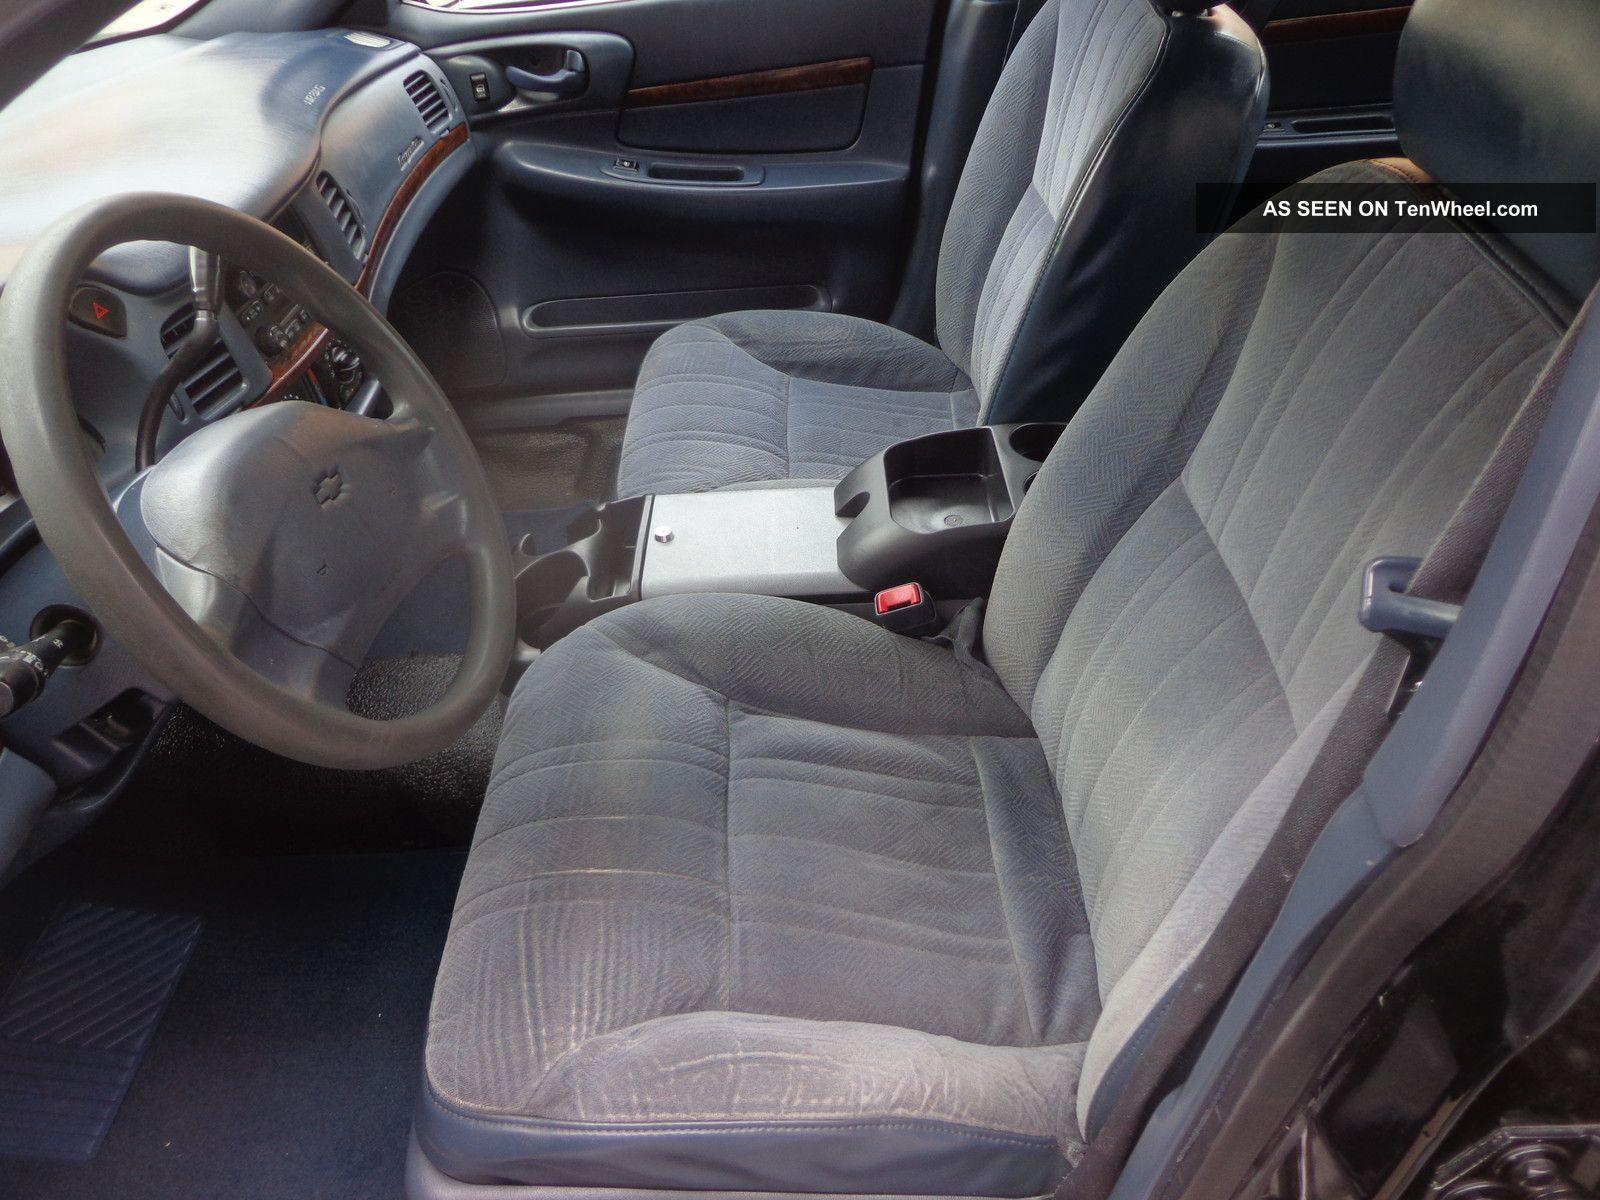 2005 Chevrolet Impala Base Sedan 4 Door 3 8l Police 9c1